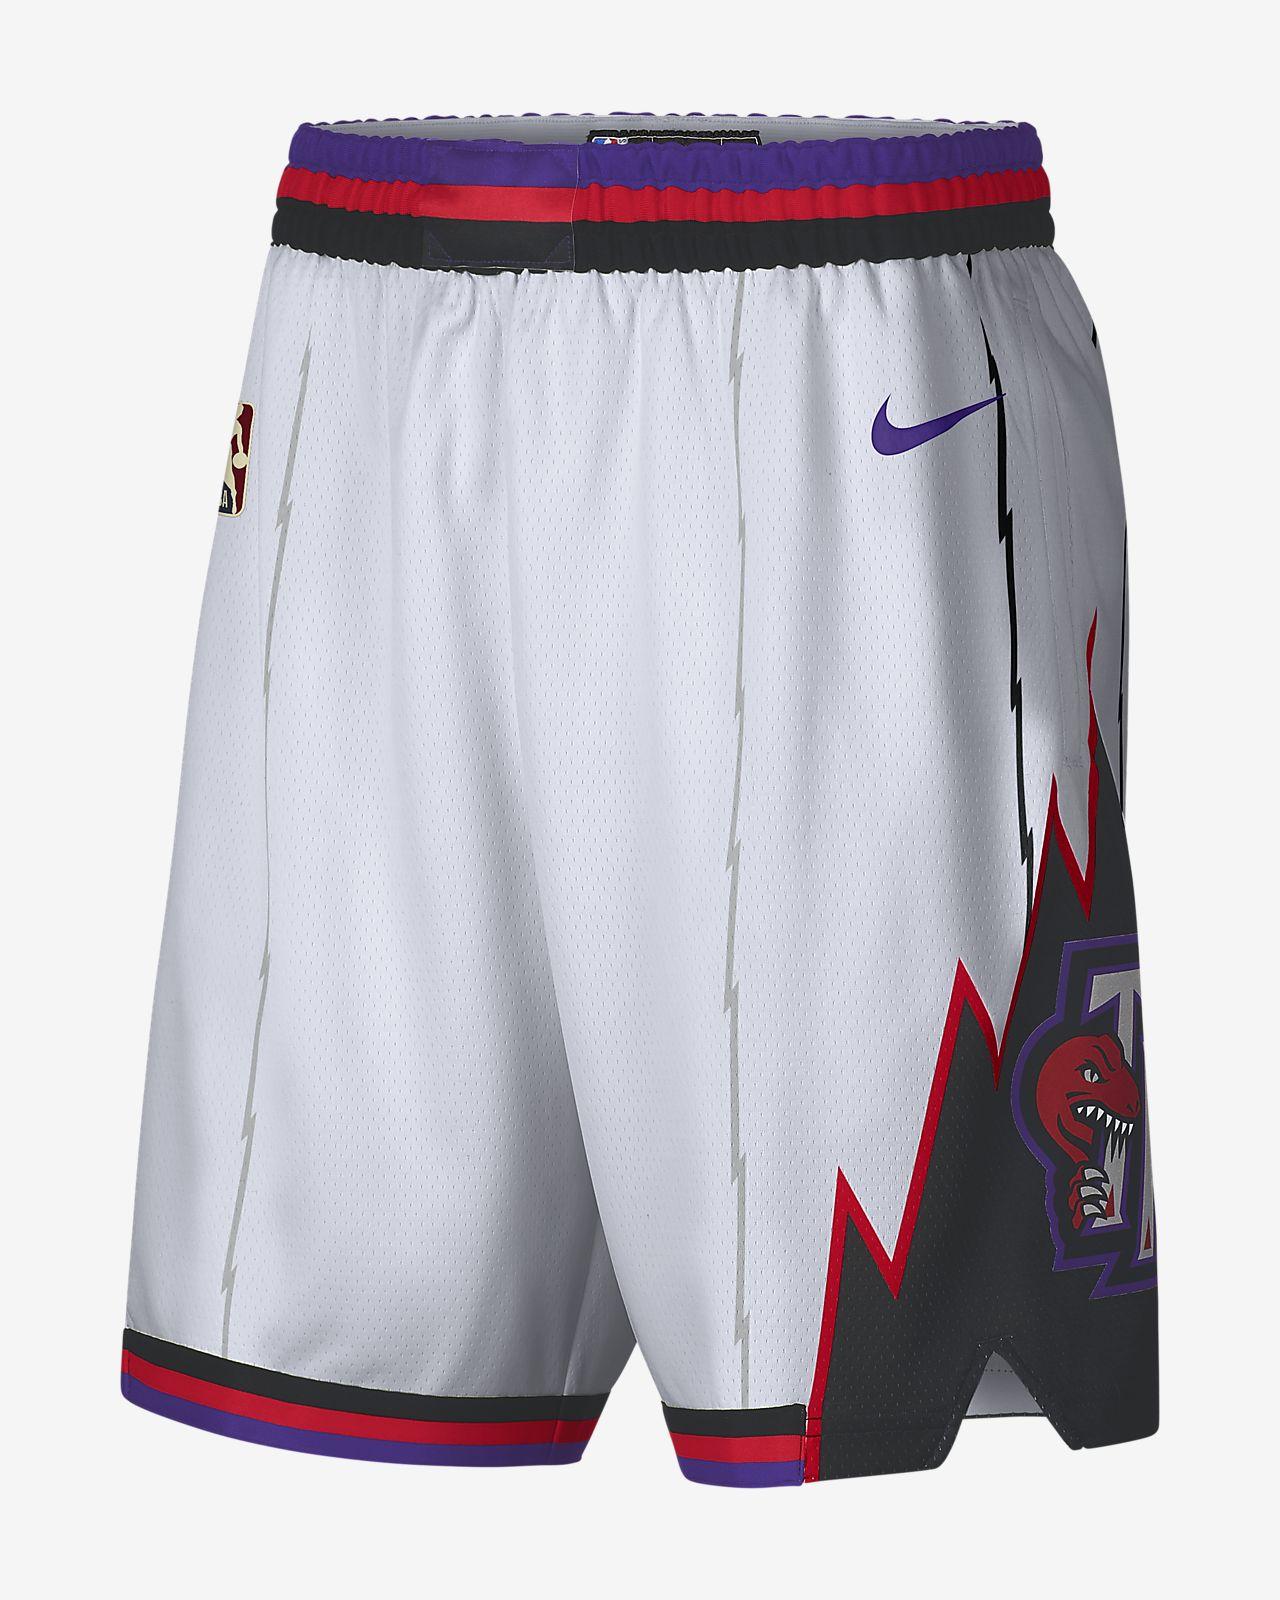 Toronto Raptors Classic Edition Swingman Nike NBA-s férfi rövidnadrág